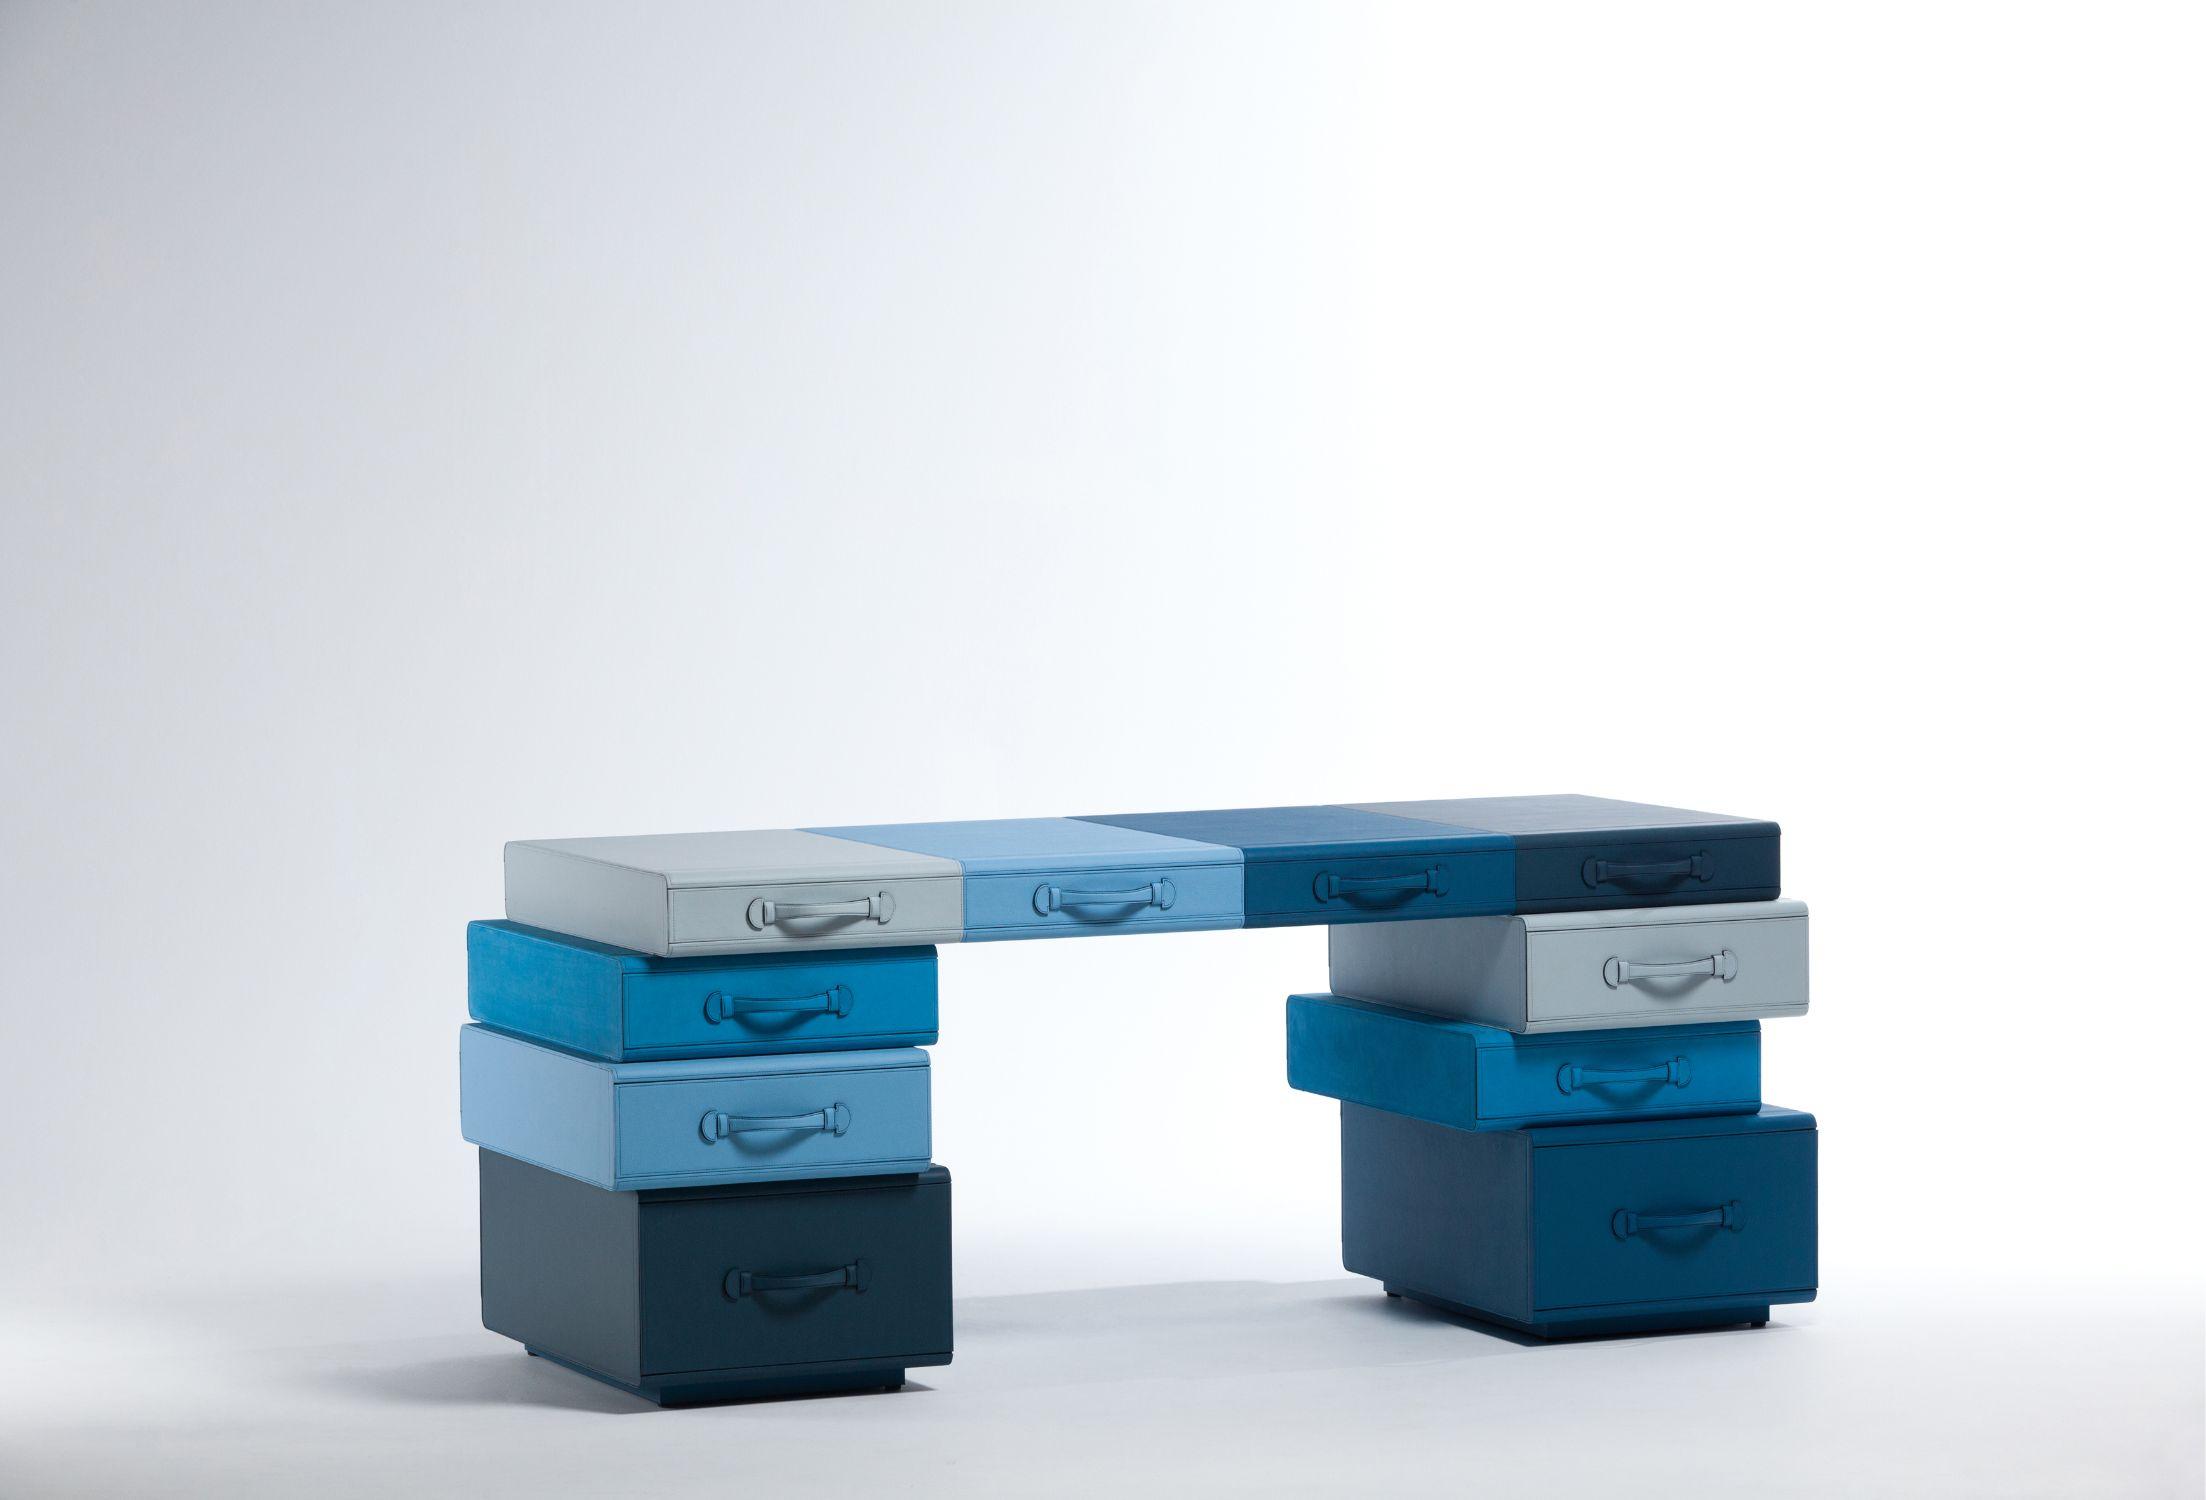 Desk of Briefcases